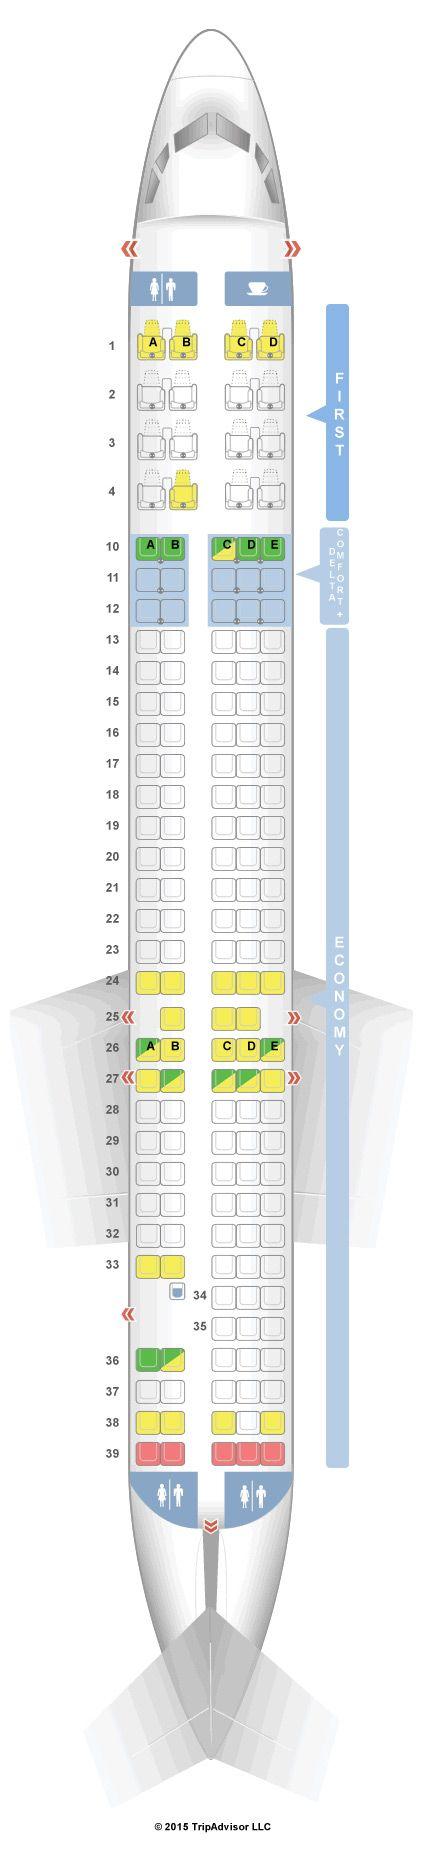 SeatGuru Seat Map Delta McDonnell Douglas MD-90 - SeatGuru